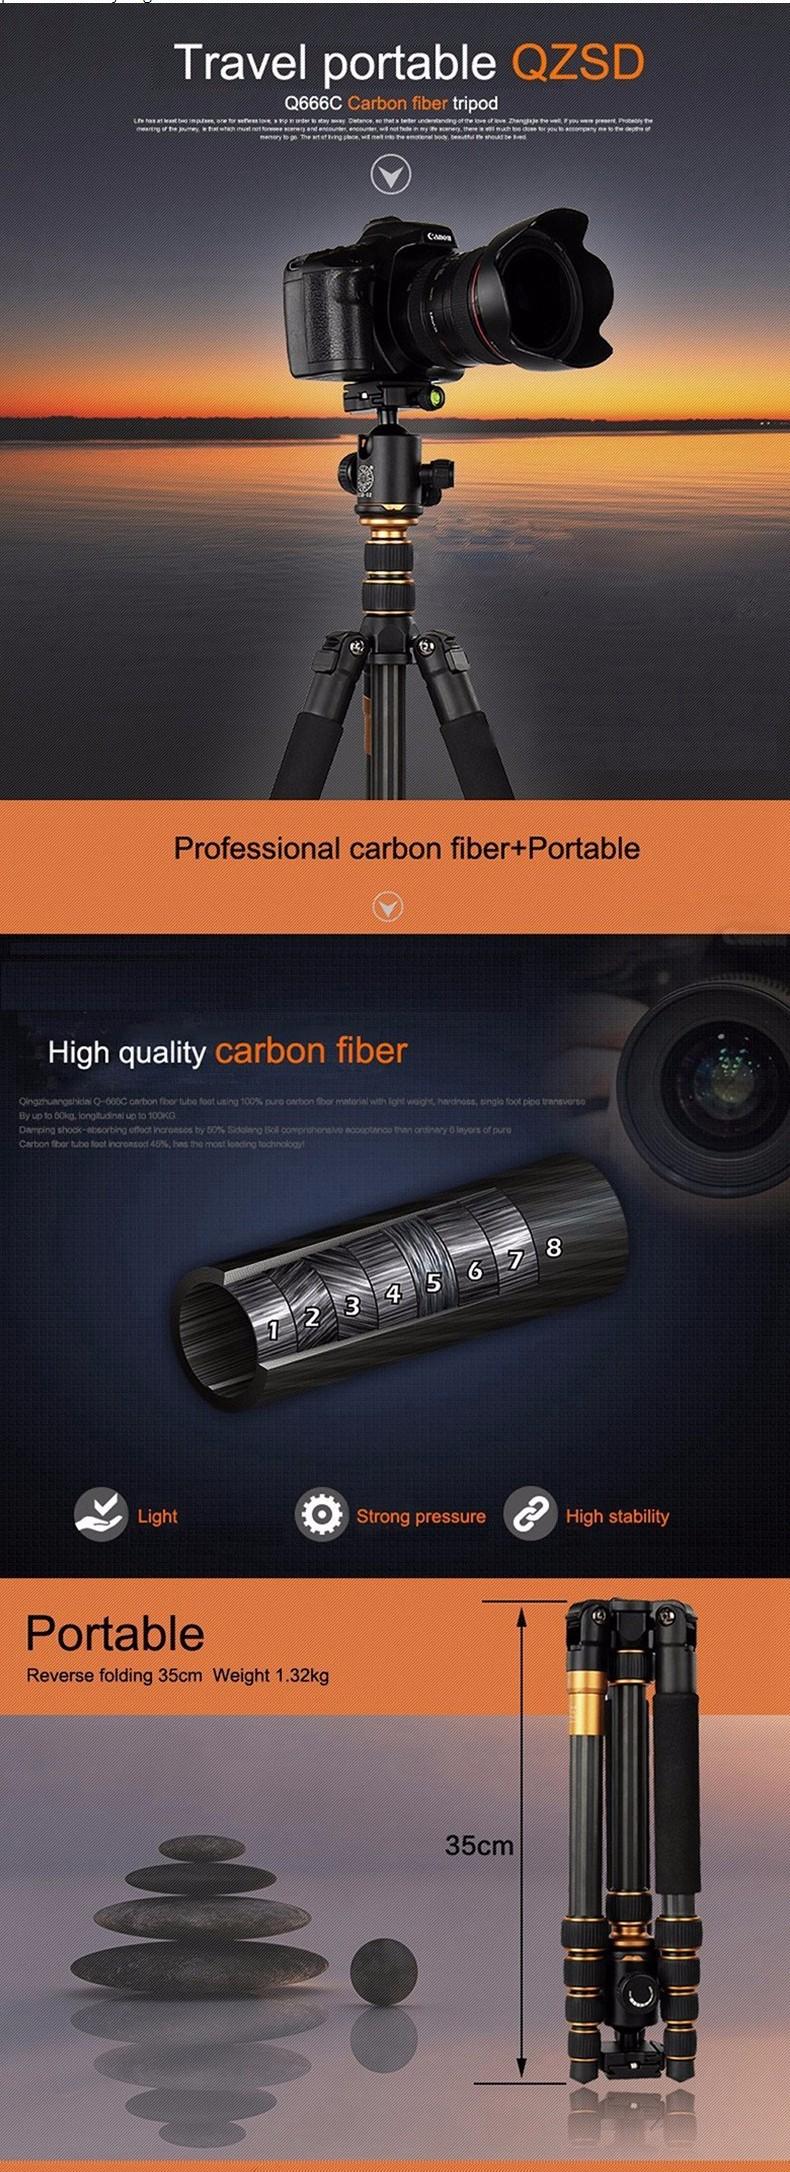 Q666C-most-hot-sell-camera-tripod_01